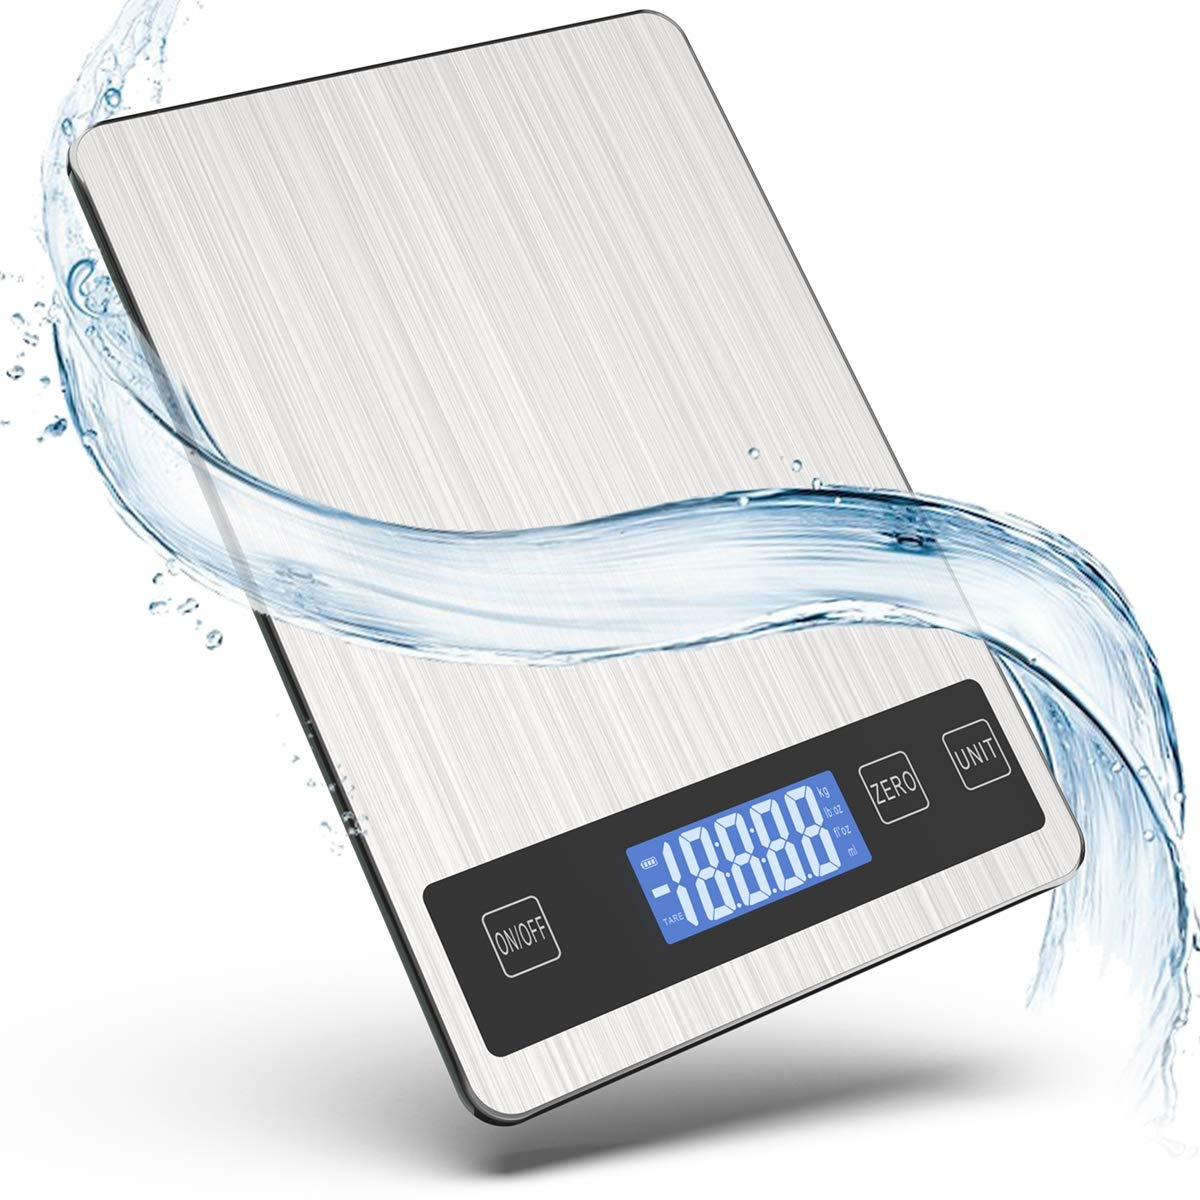 Báscula digital de cocina, báscula de cocina eléctrica, 5 kg, de acero inoxidable, con pantalla LED, tara y características, para cocina, ingredientes, joyas, drogas, café, té